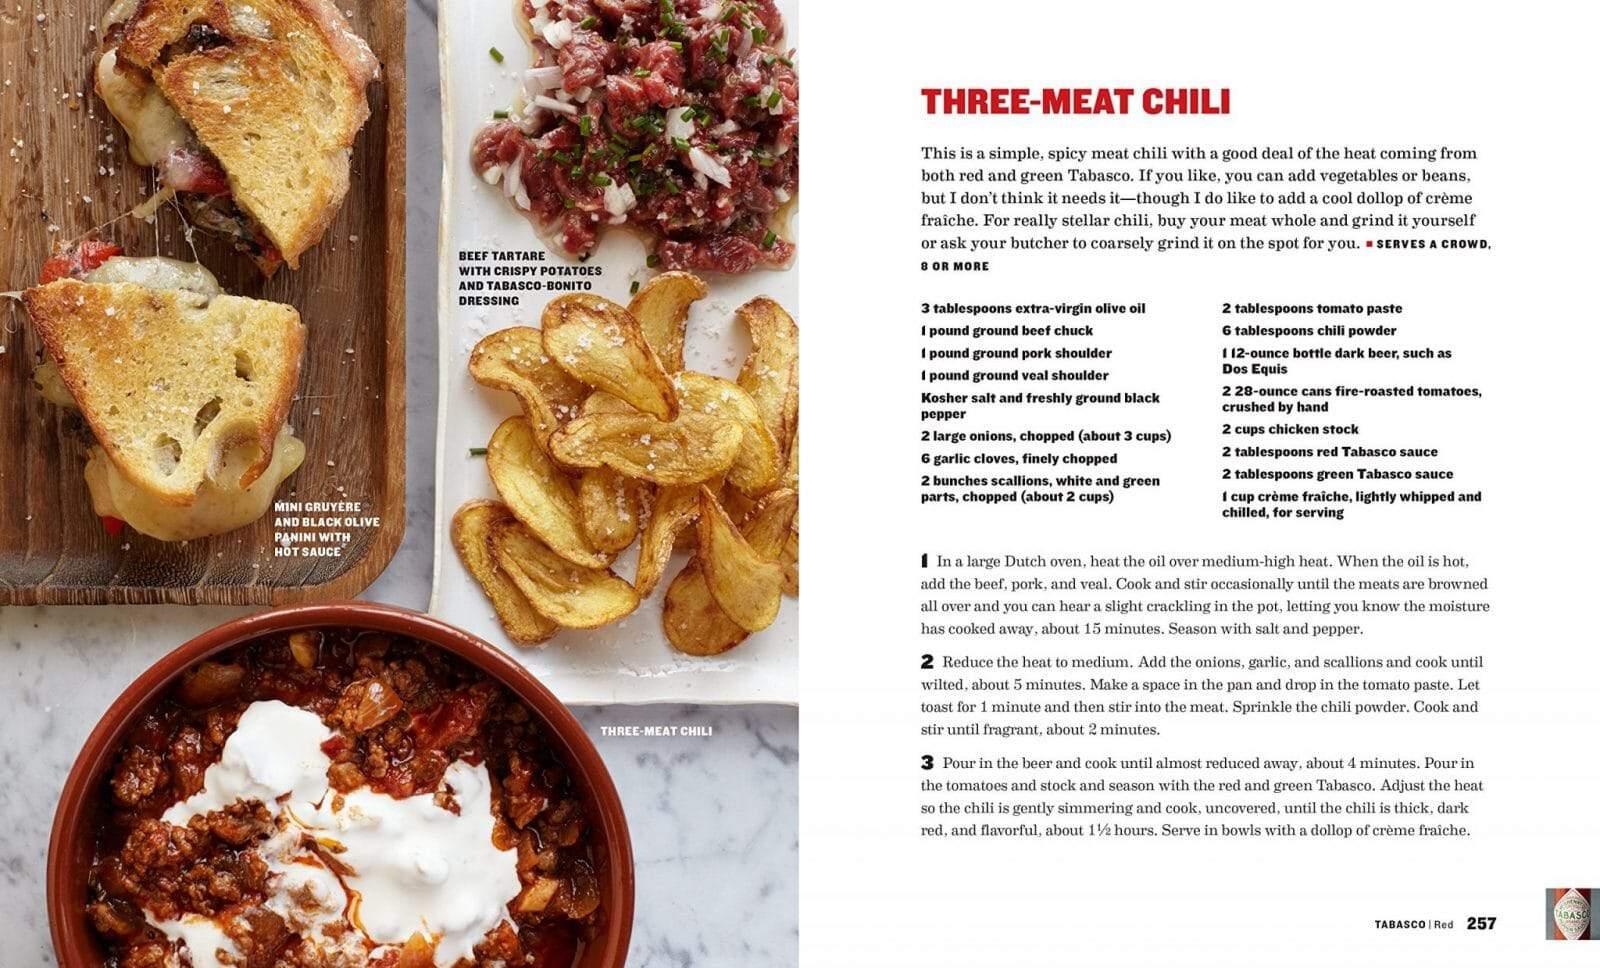 food ingredients Crit rev food sci nutr 201353(9):929-42 doi: 101080/104083982011574215  food ingredients as anti-obesity agents: a review trigueros l(1), peña s,.